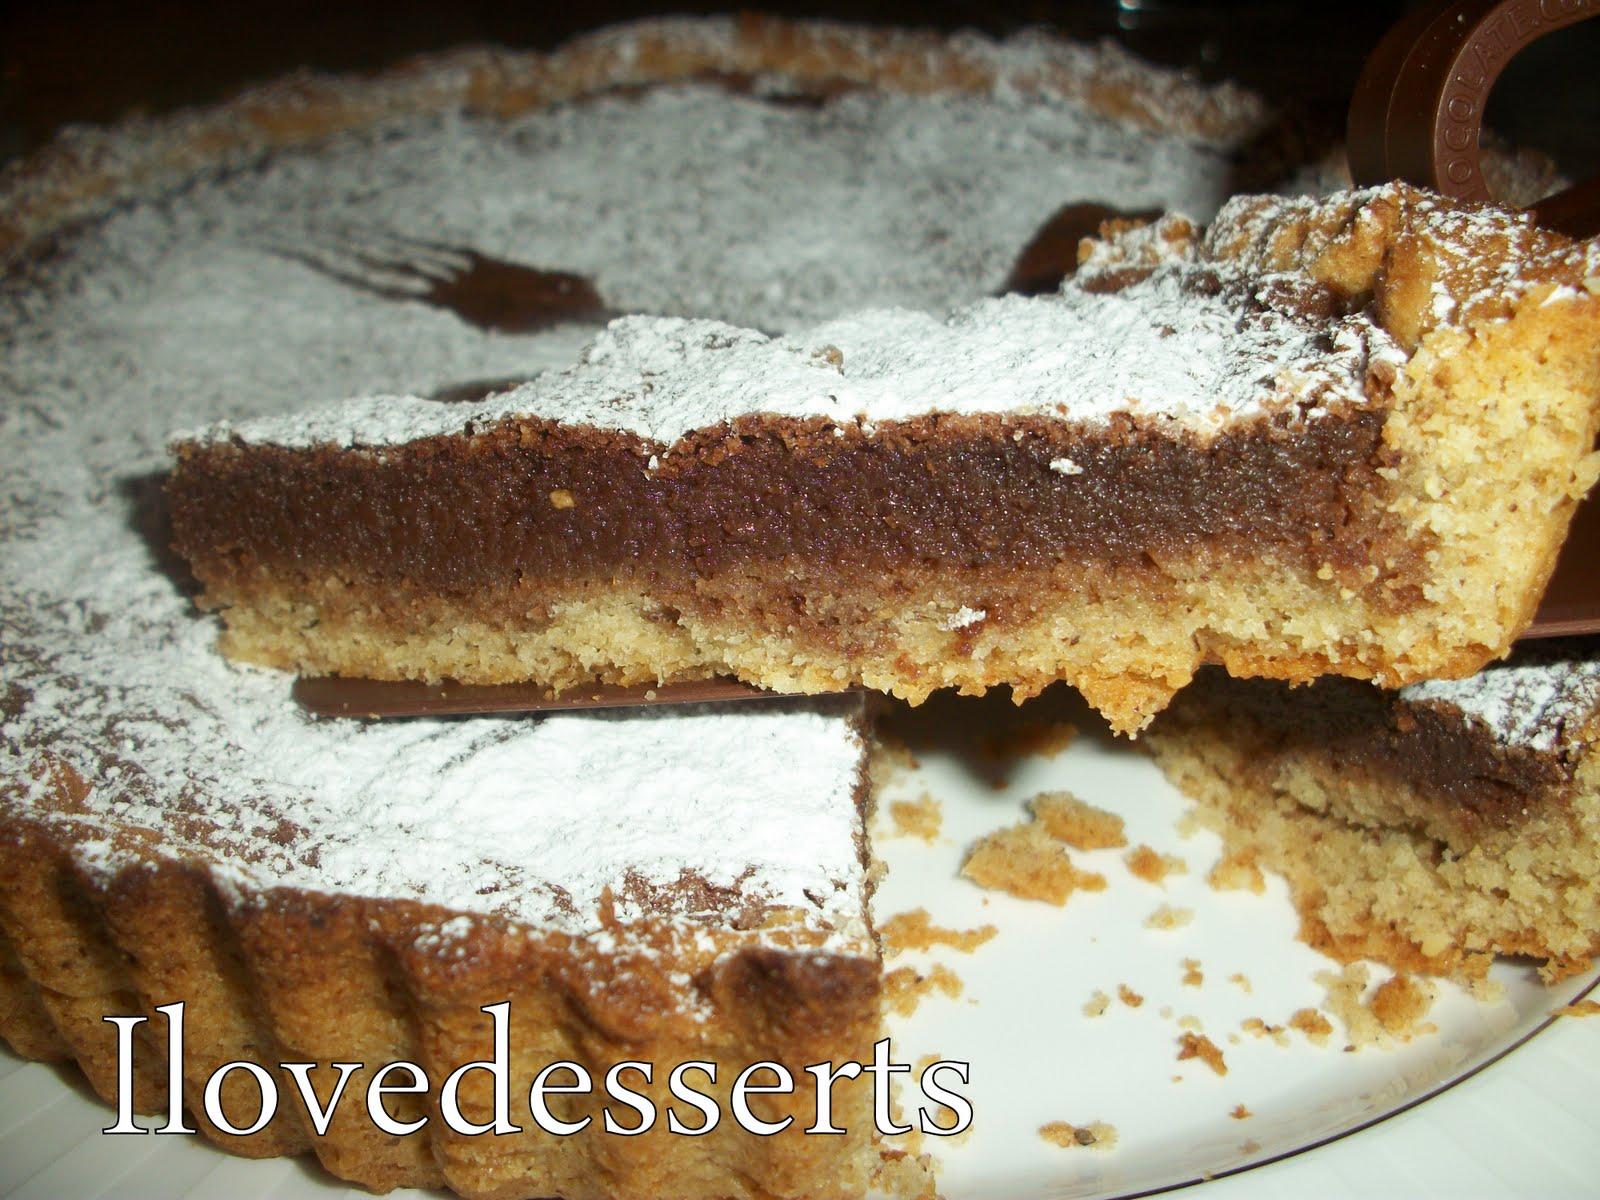 Dolci Ricette Facili Cake Ideas and Designs